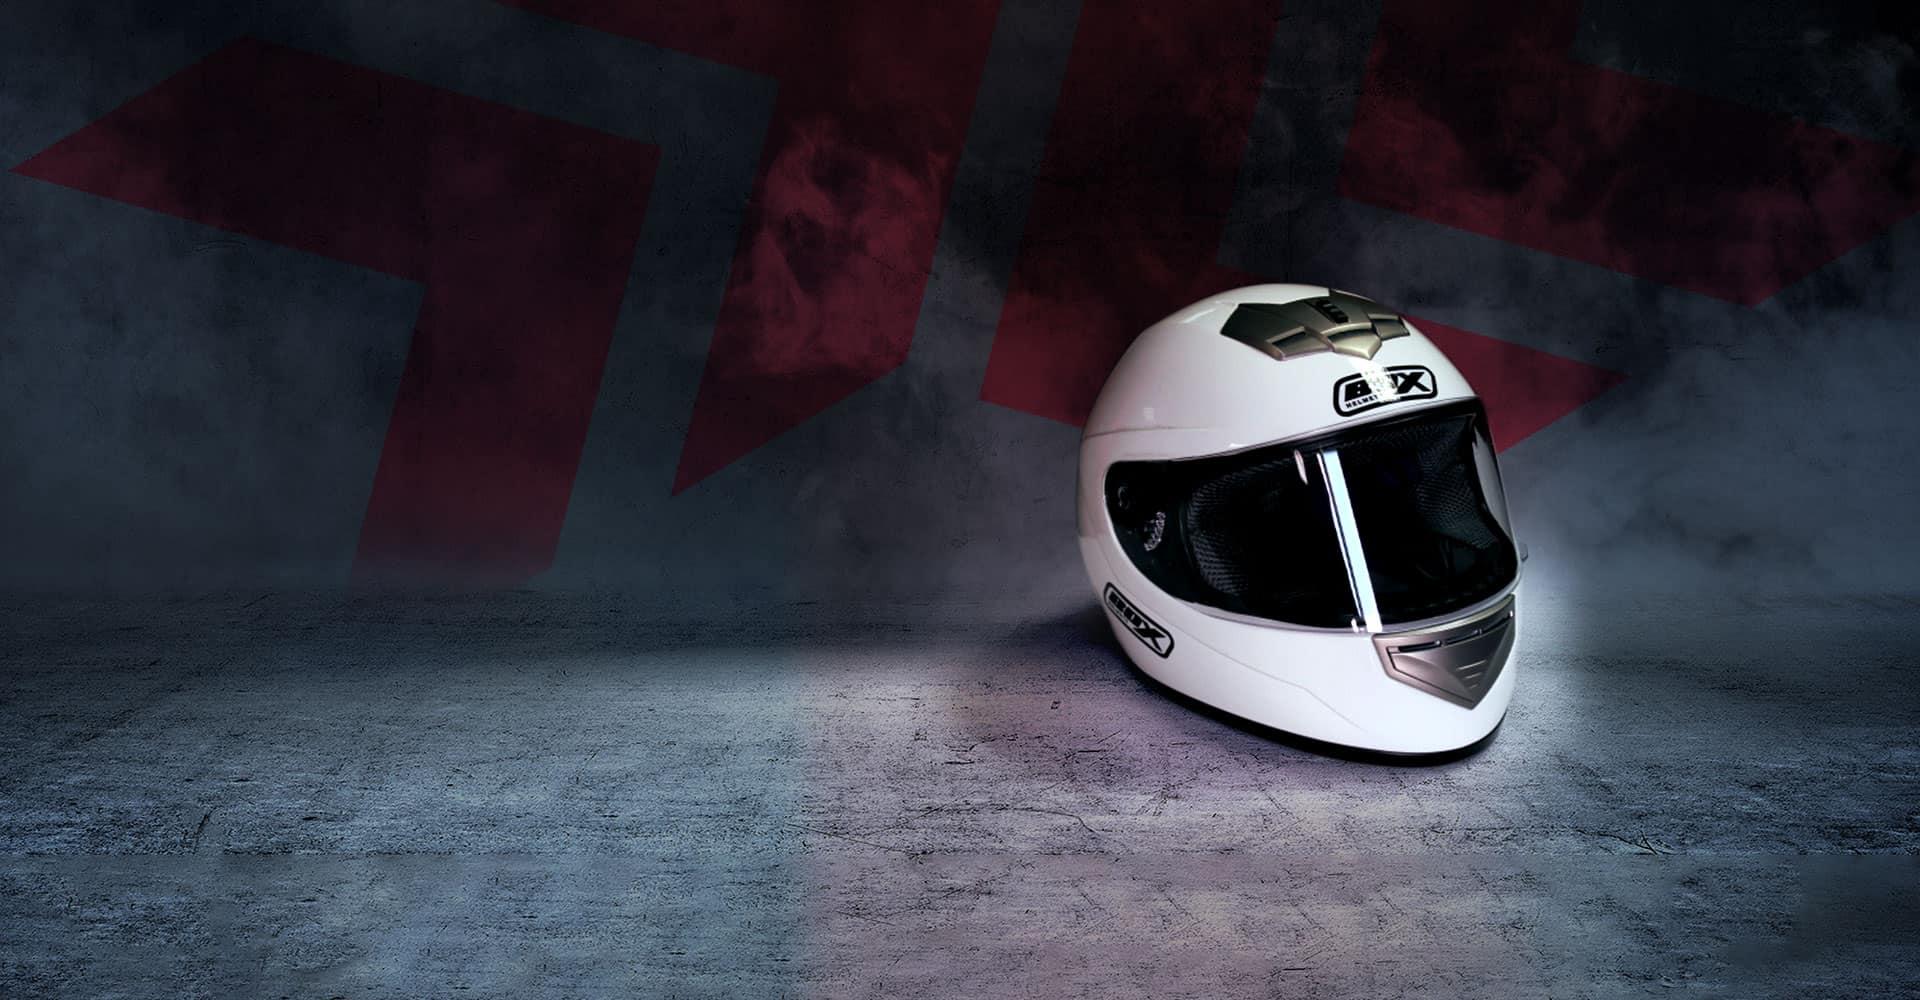 INSTAGRAM COMPETITION | WIN A RACE HELMET